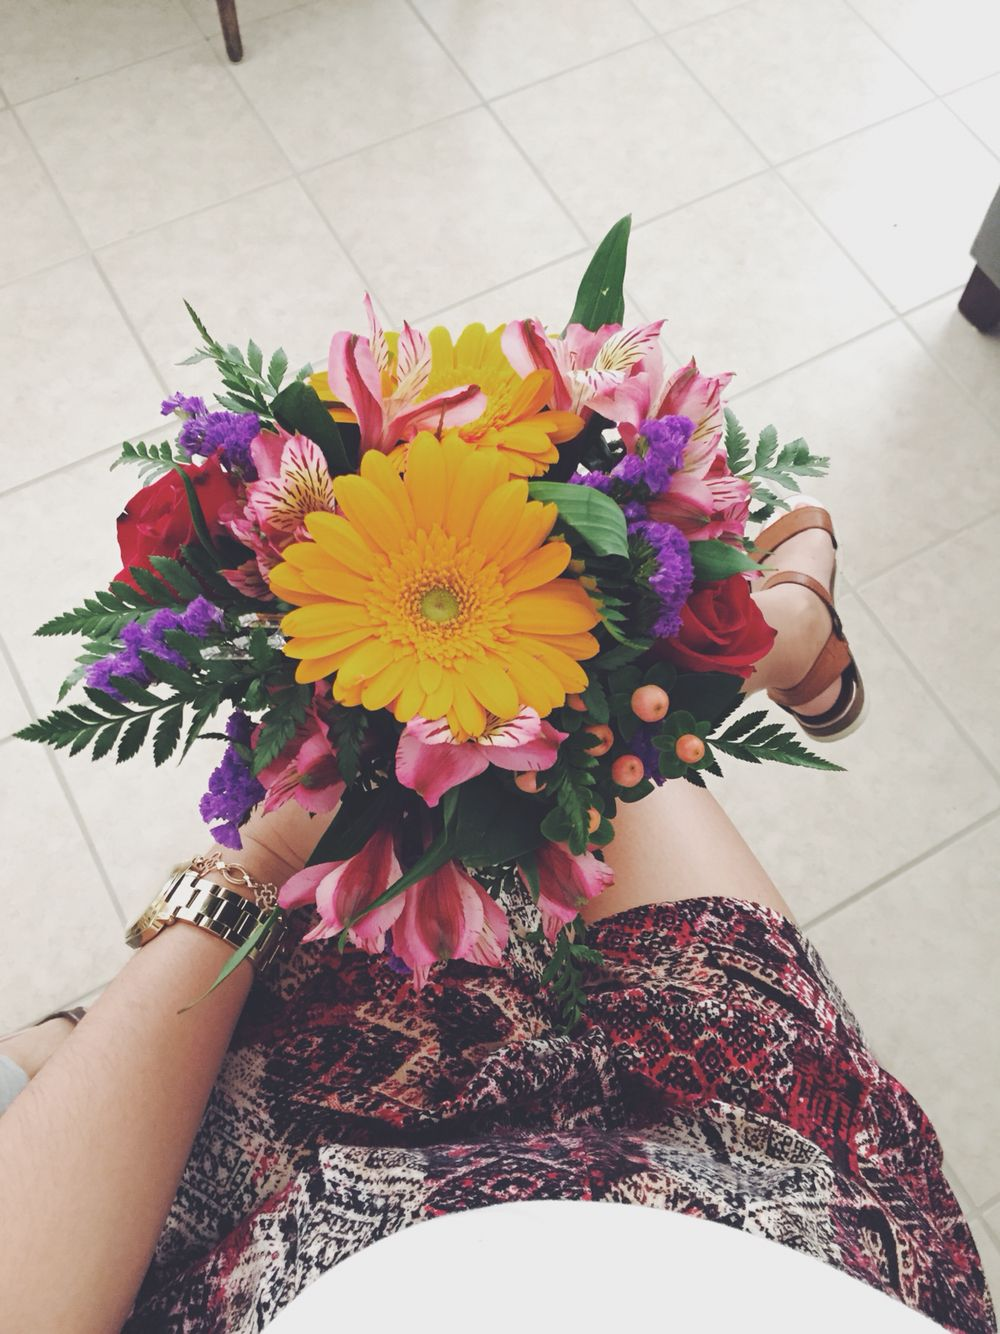 Flowers from the boyfriend | Flowers bouquet gift, Flowers